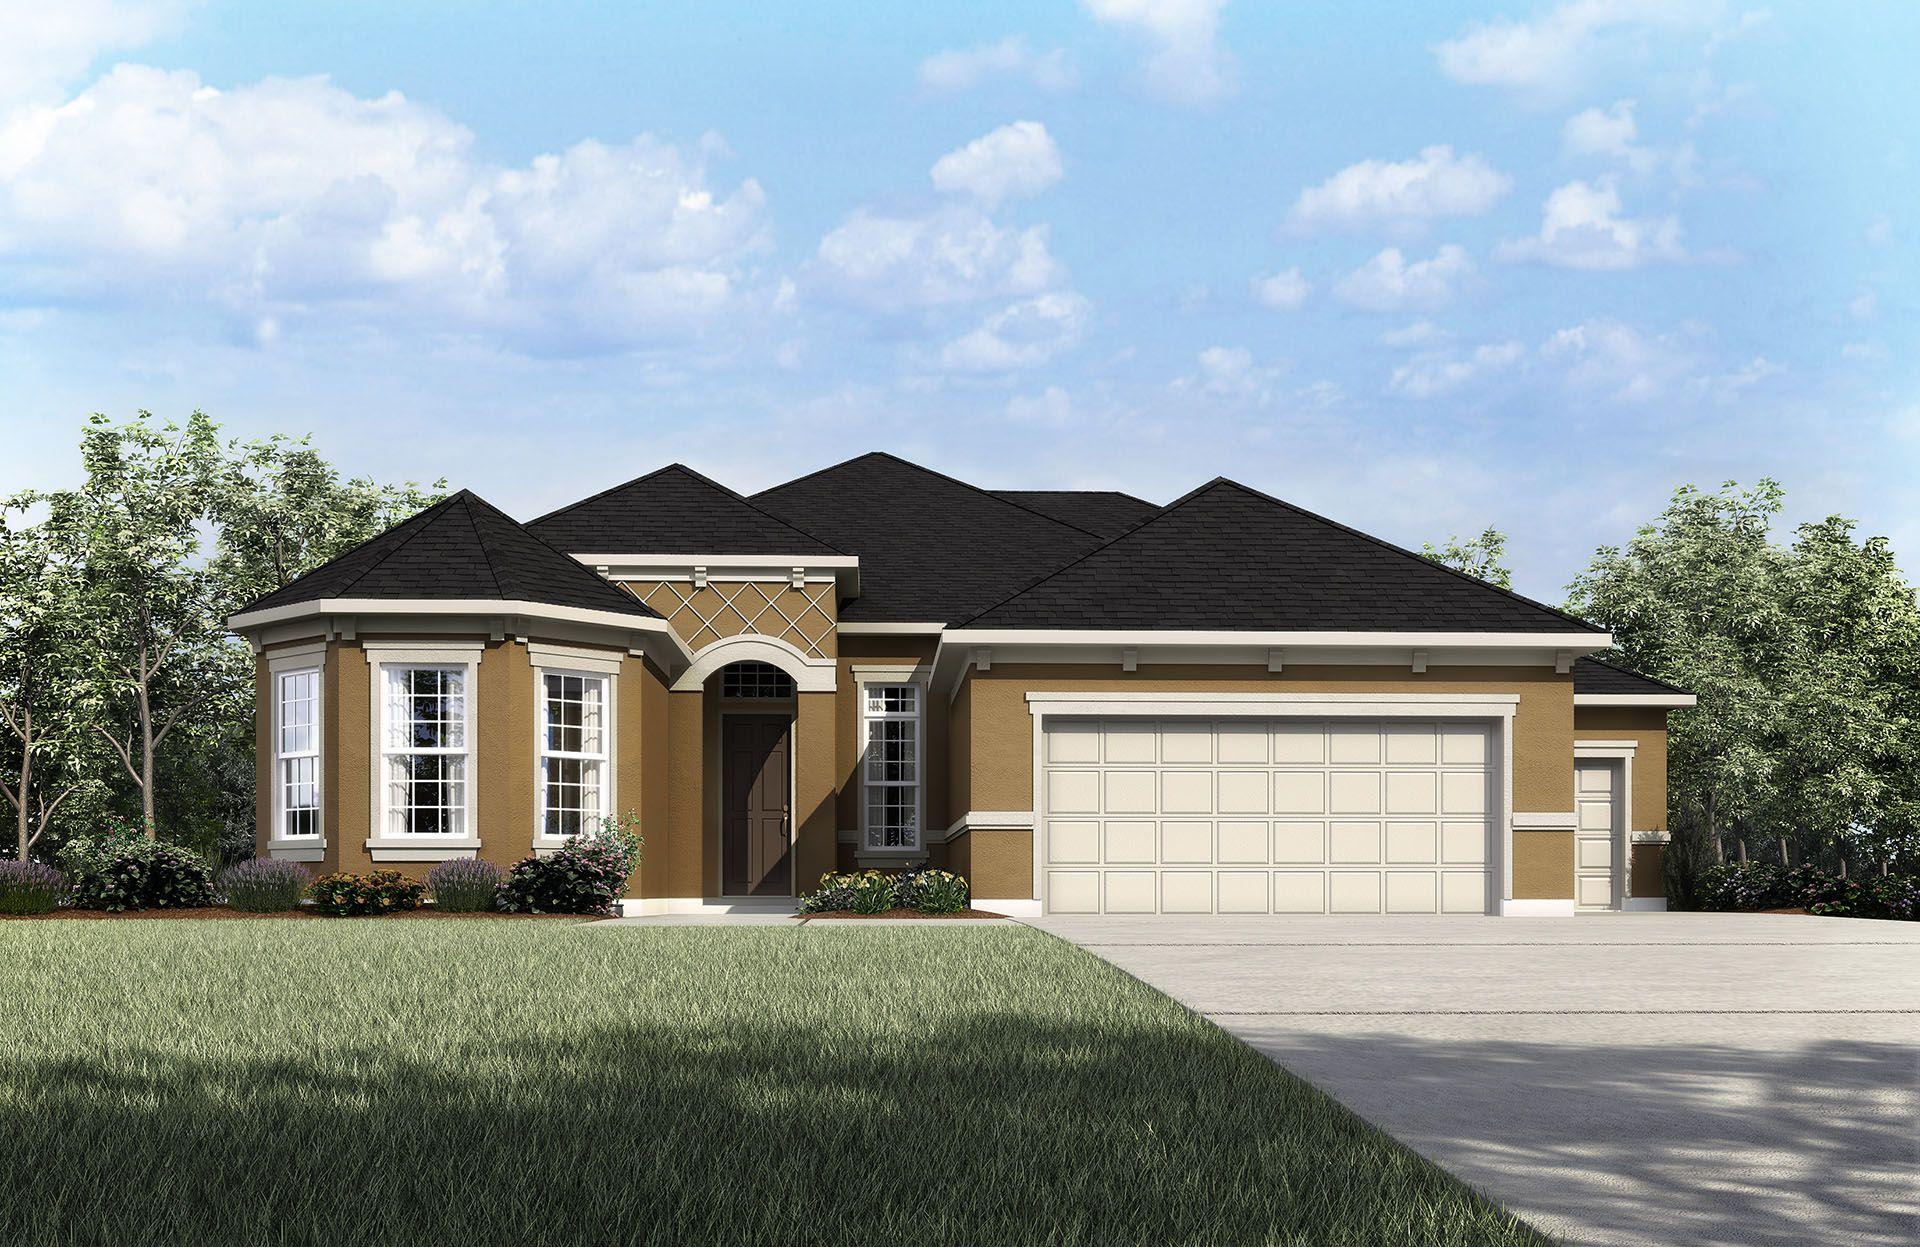 Single Family for Sale at Jacksonville Offsite - Northgate Jacksonville, Florida 32257 United States